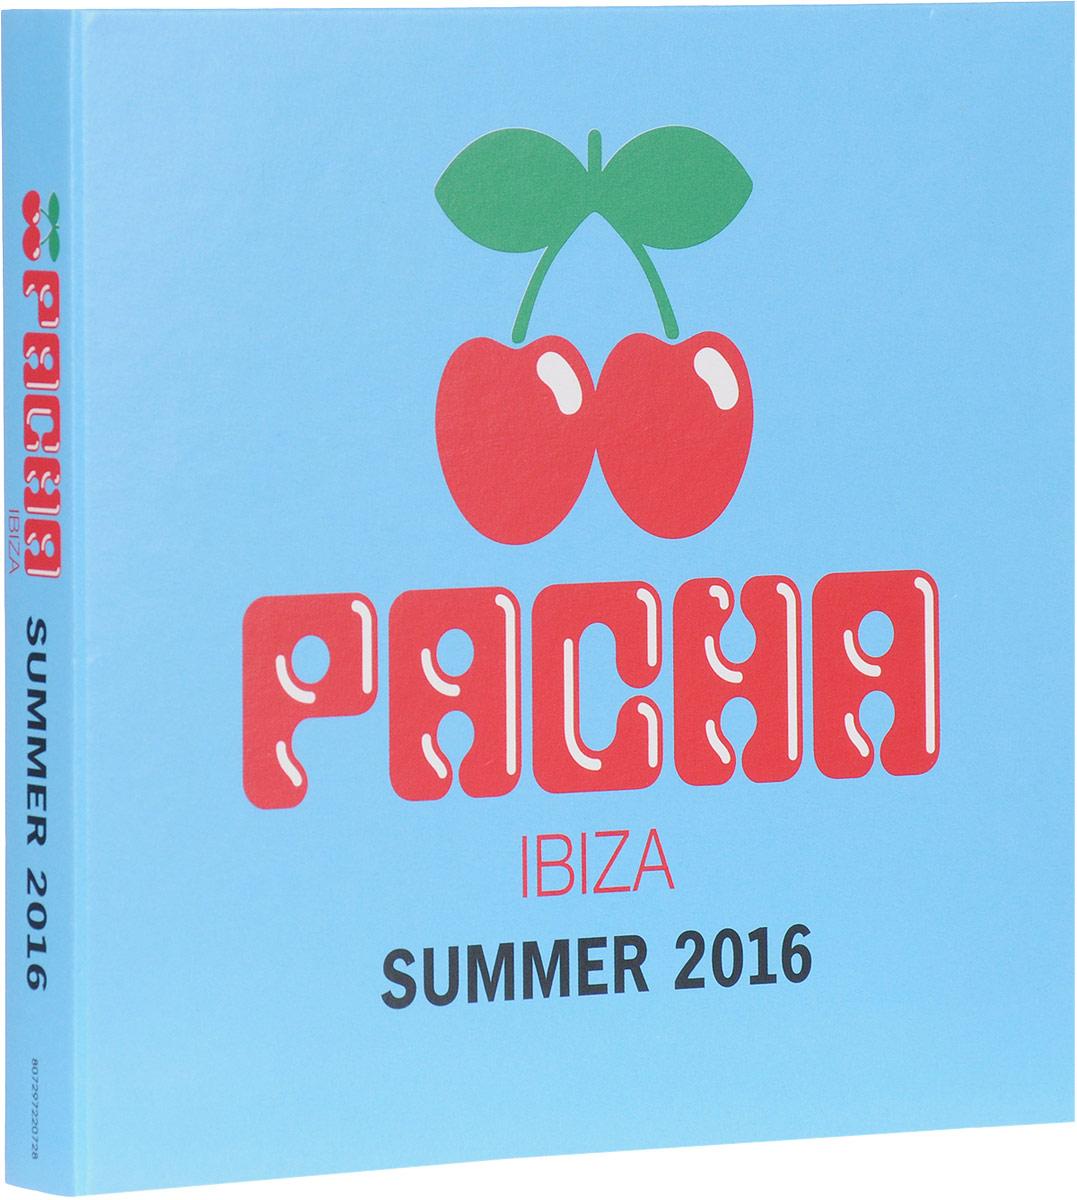 Pacha 2016 Ibiza Summer Edition (3 CD) ноутбук dell xps 13 9365 6225 intel core i5 7y54 1 2 ghz 8192mb 256gb ssd no odd intel hd graphics wi fi bluetooth cam 13 3 3200x1800 touchscreen windows 10 64 bit